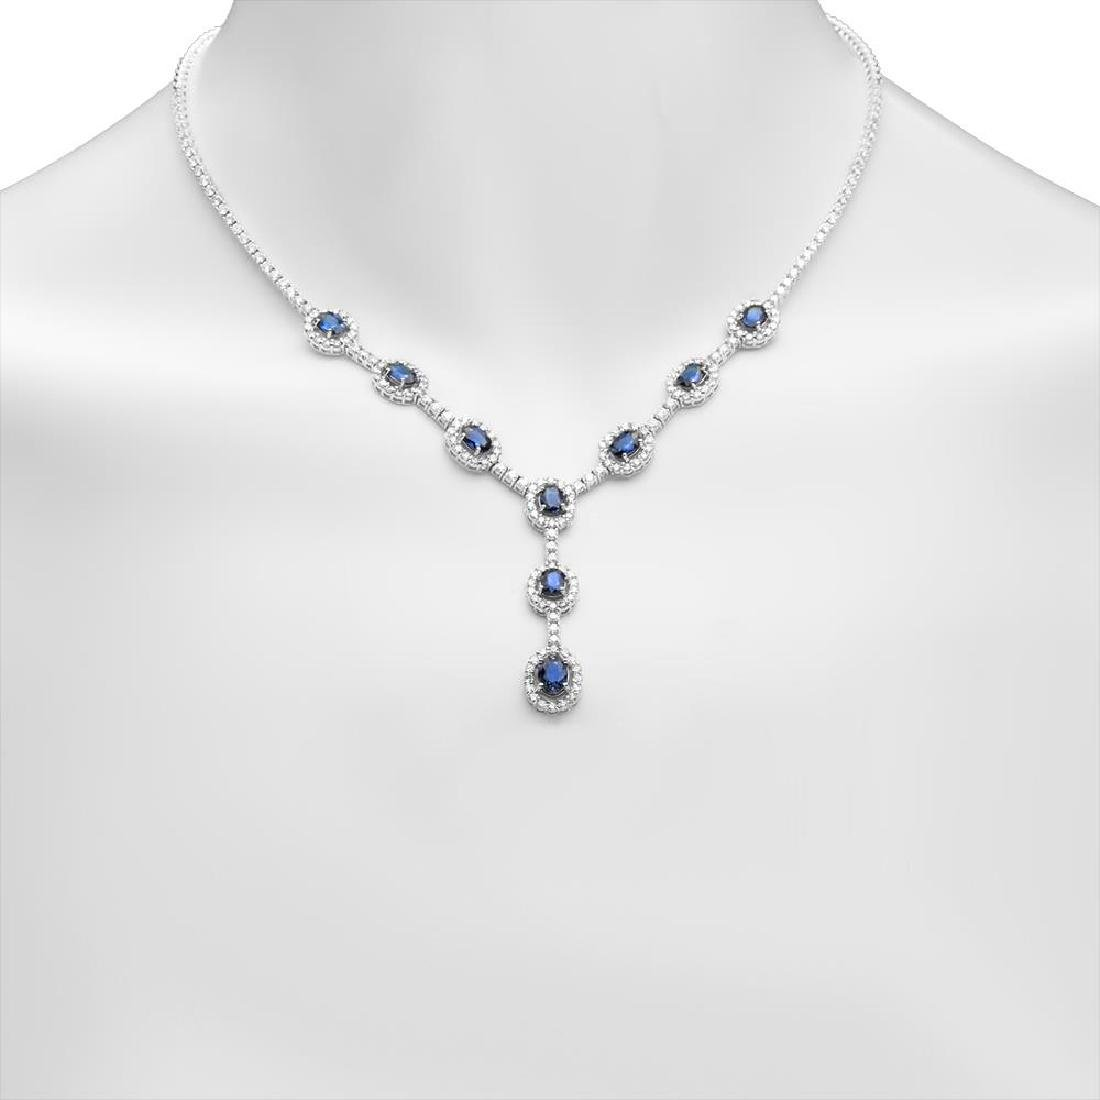 14K Gold 5.02ct Sapphire 5.67cts Diamond Necklace